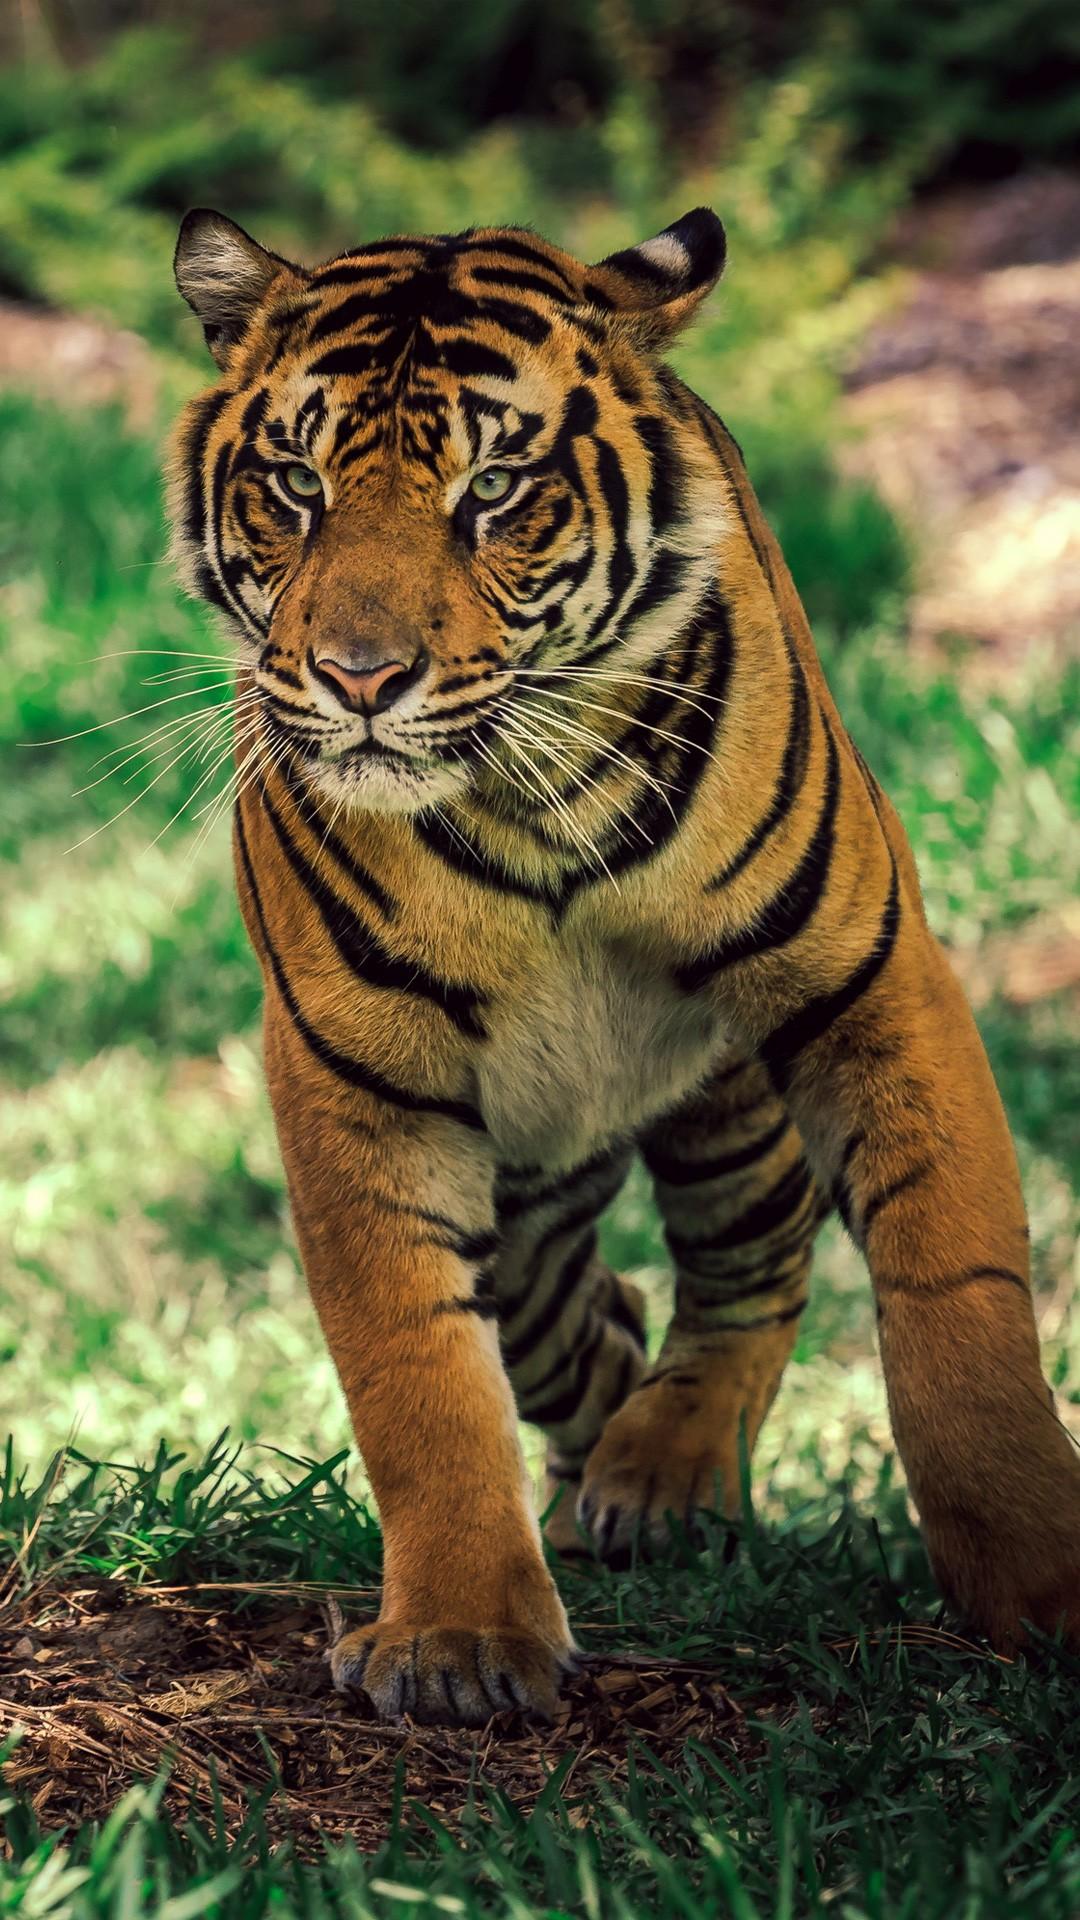 Best Iphone 6s Wallpapers Hd Savanna Tiger Wildlife Wallpapers Hd Wallpapers Id 18016